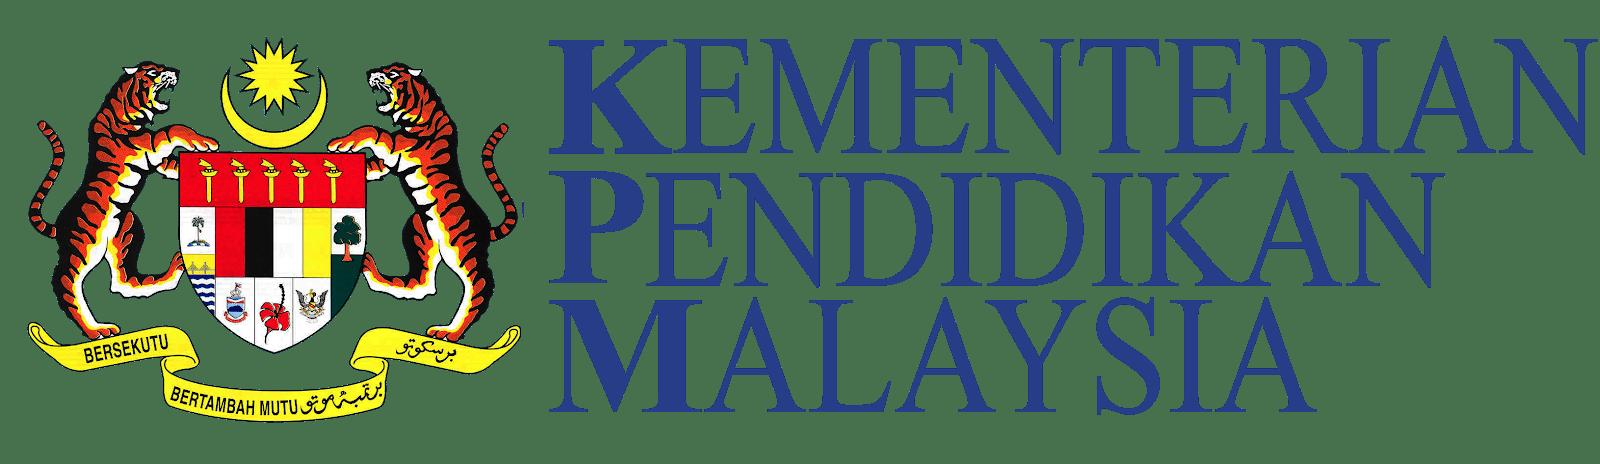 Kementerian Pendidikan Pandang Serius Penularan Surat Sarawakvoice Com